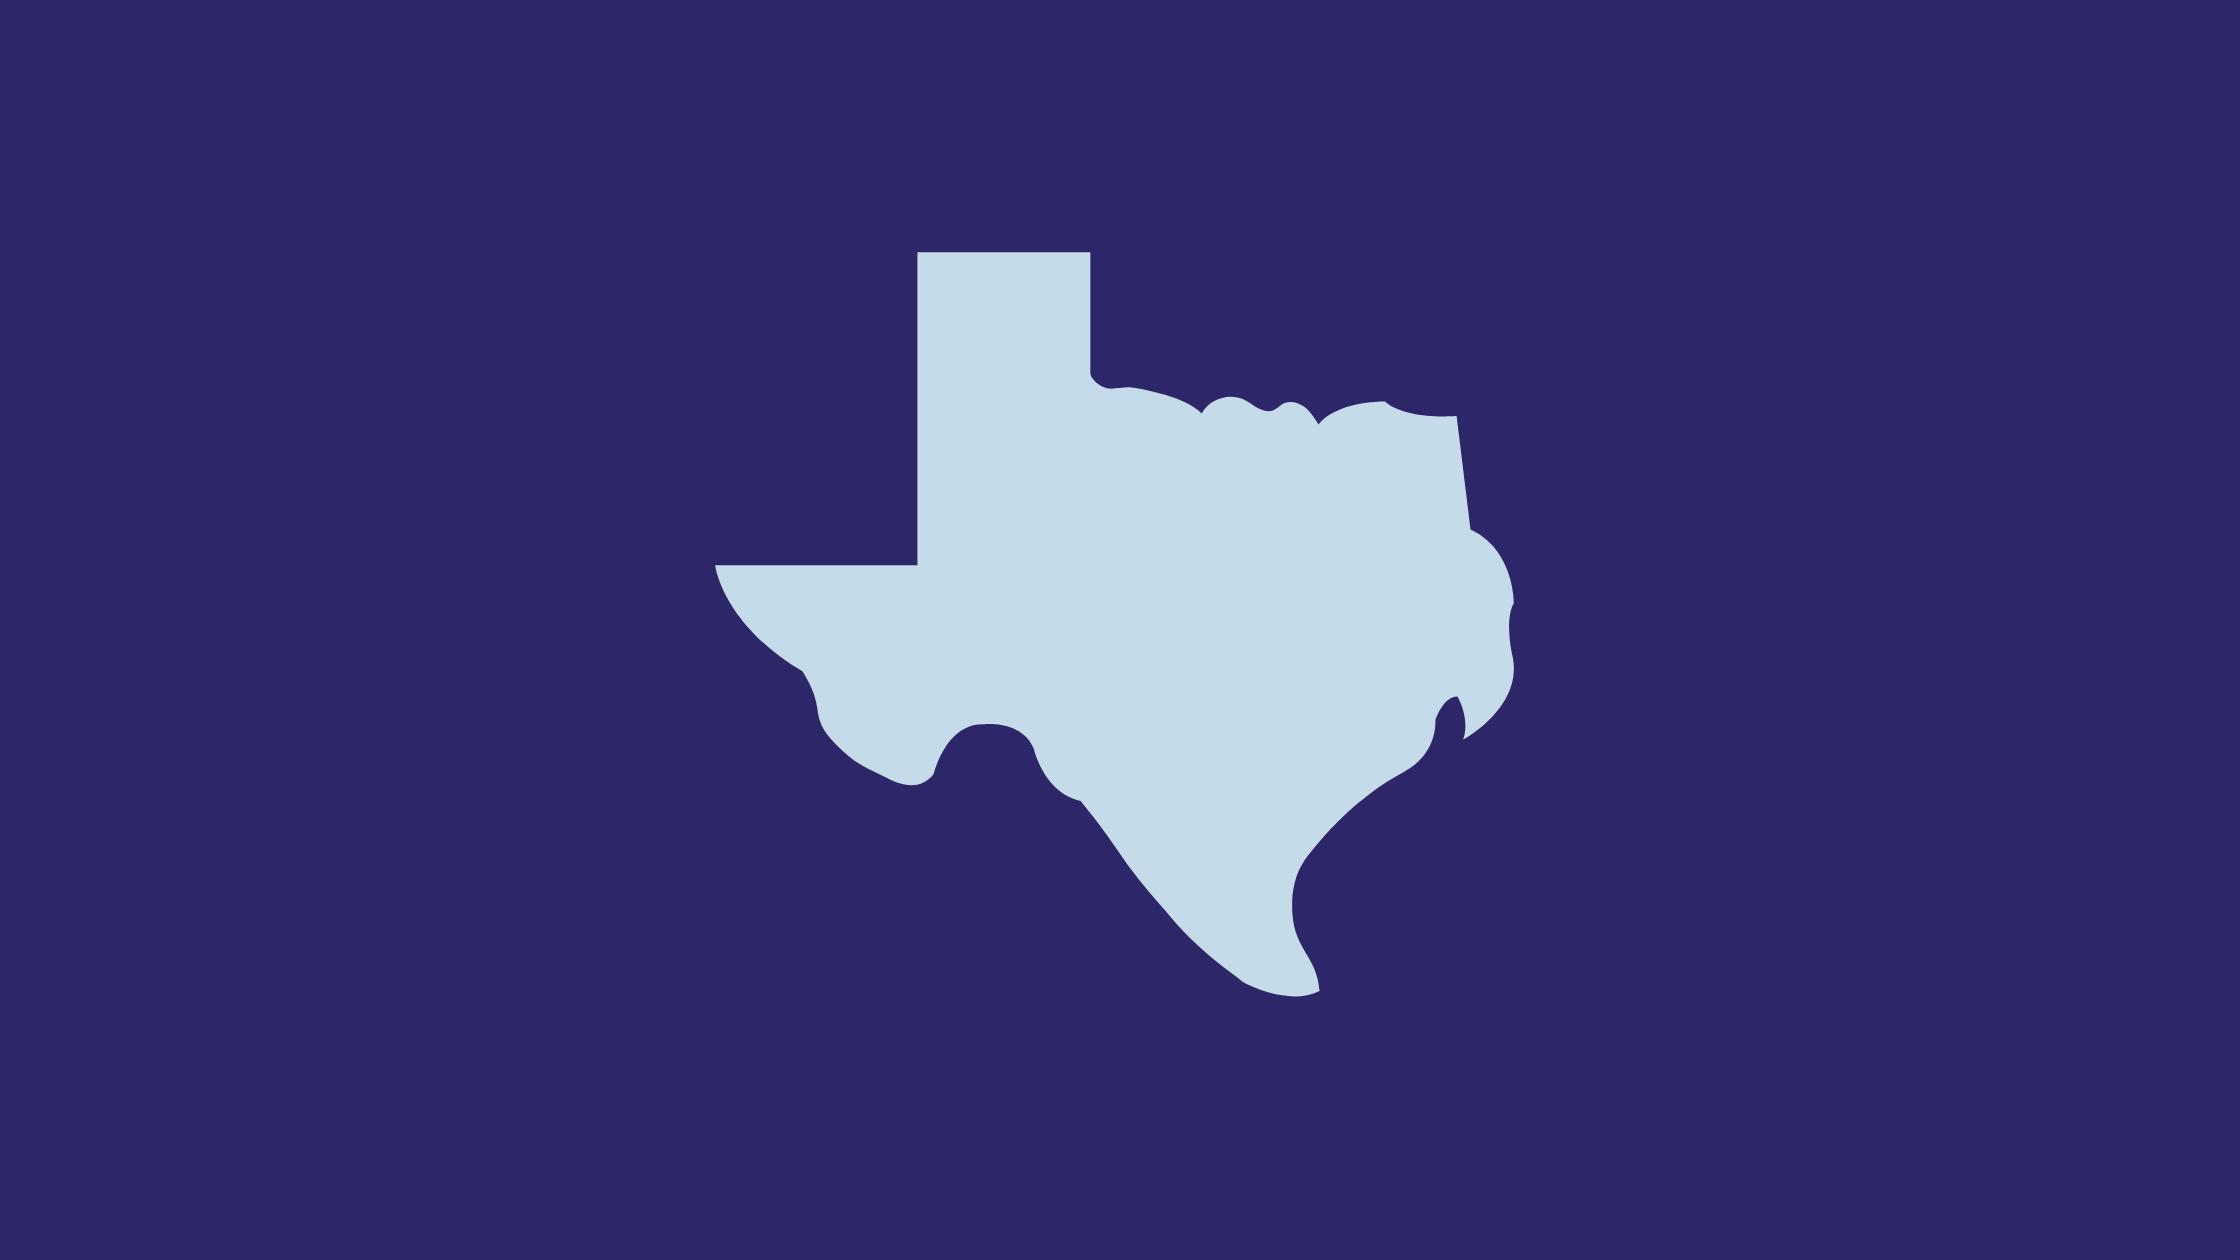 Texas silhouette